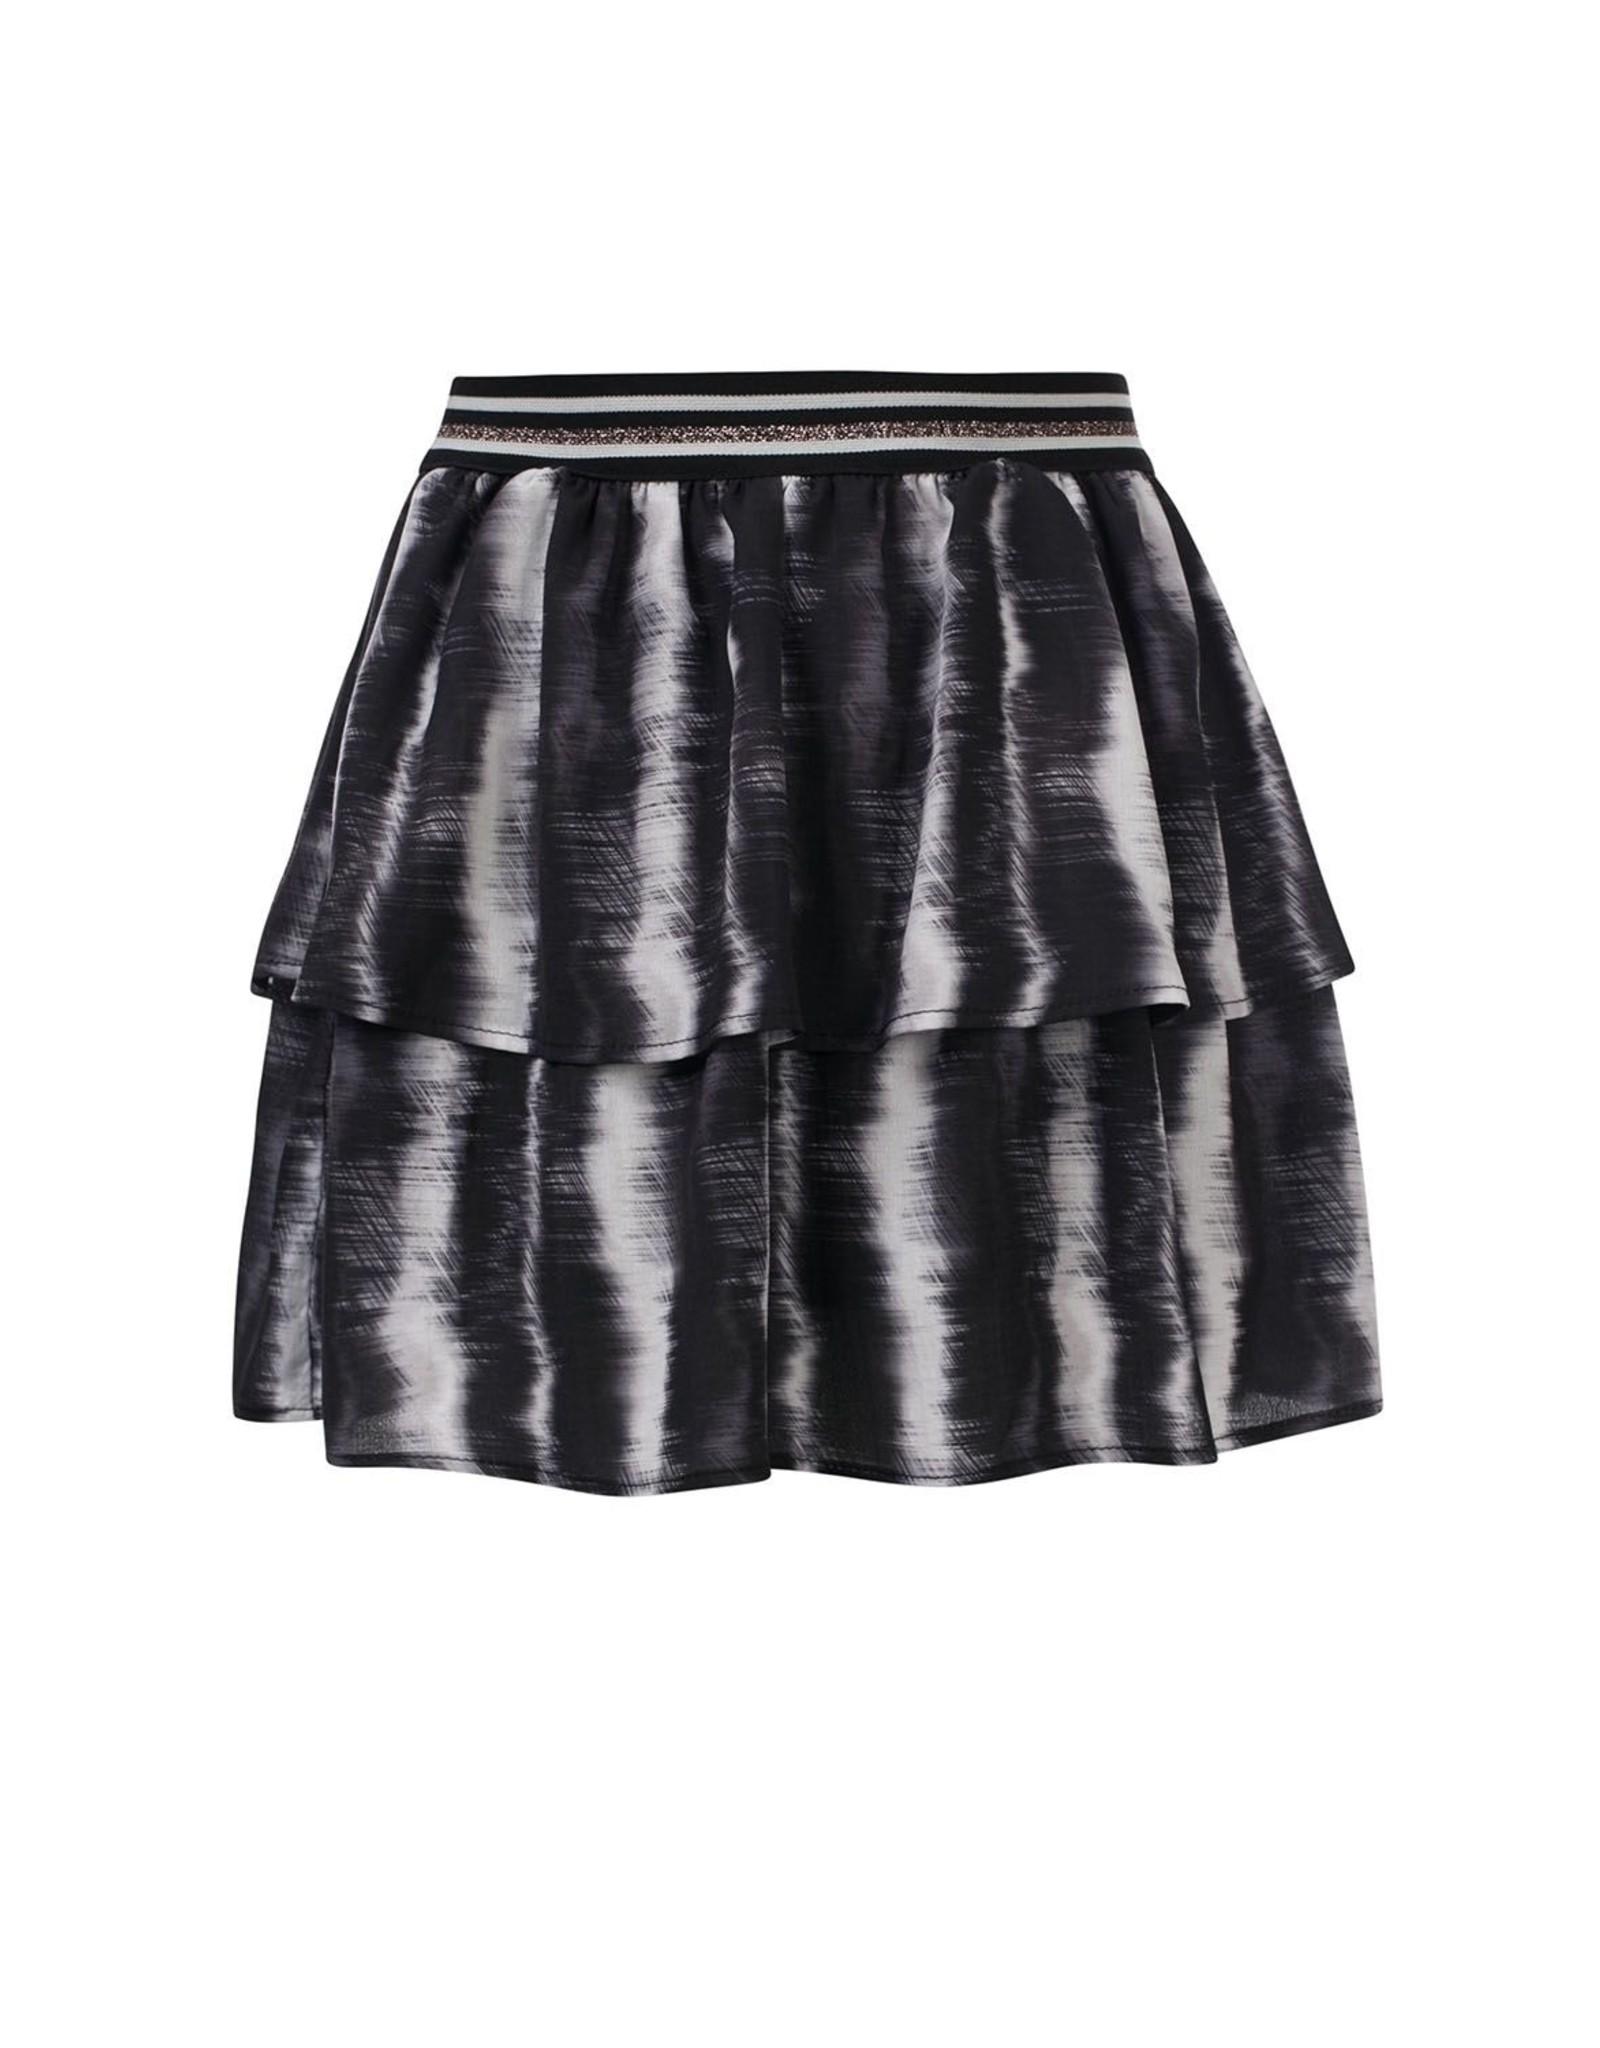 Looxs 10SIXTEEN 10Sixteen chiffon skirt